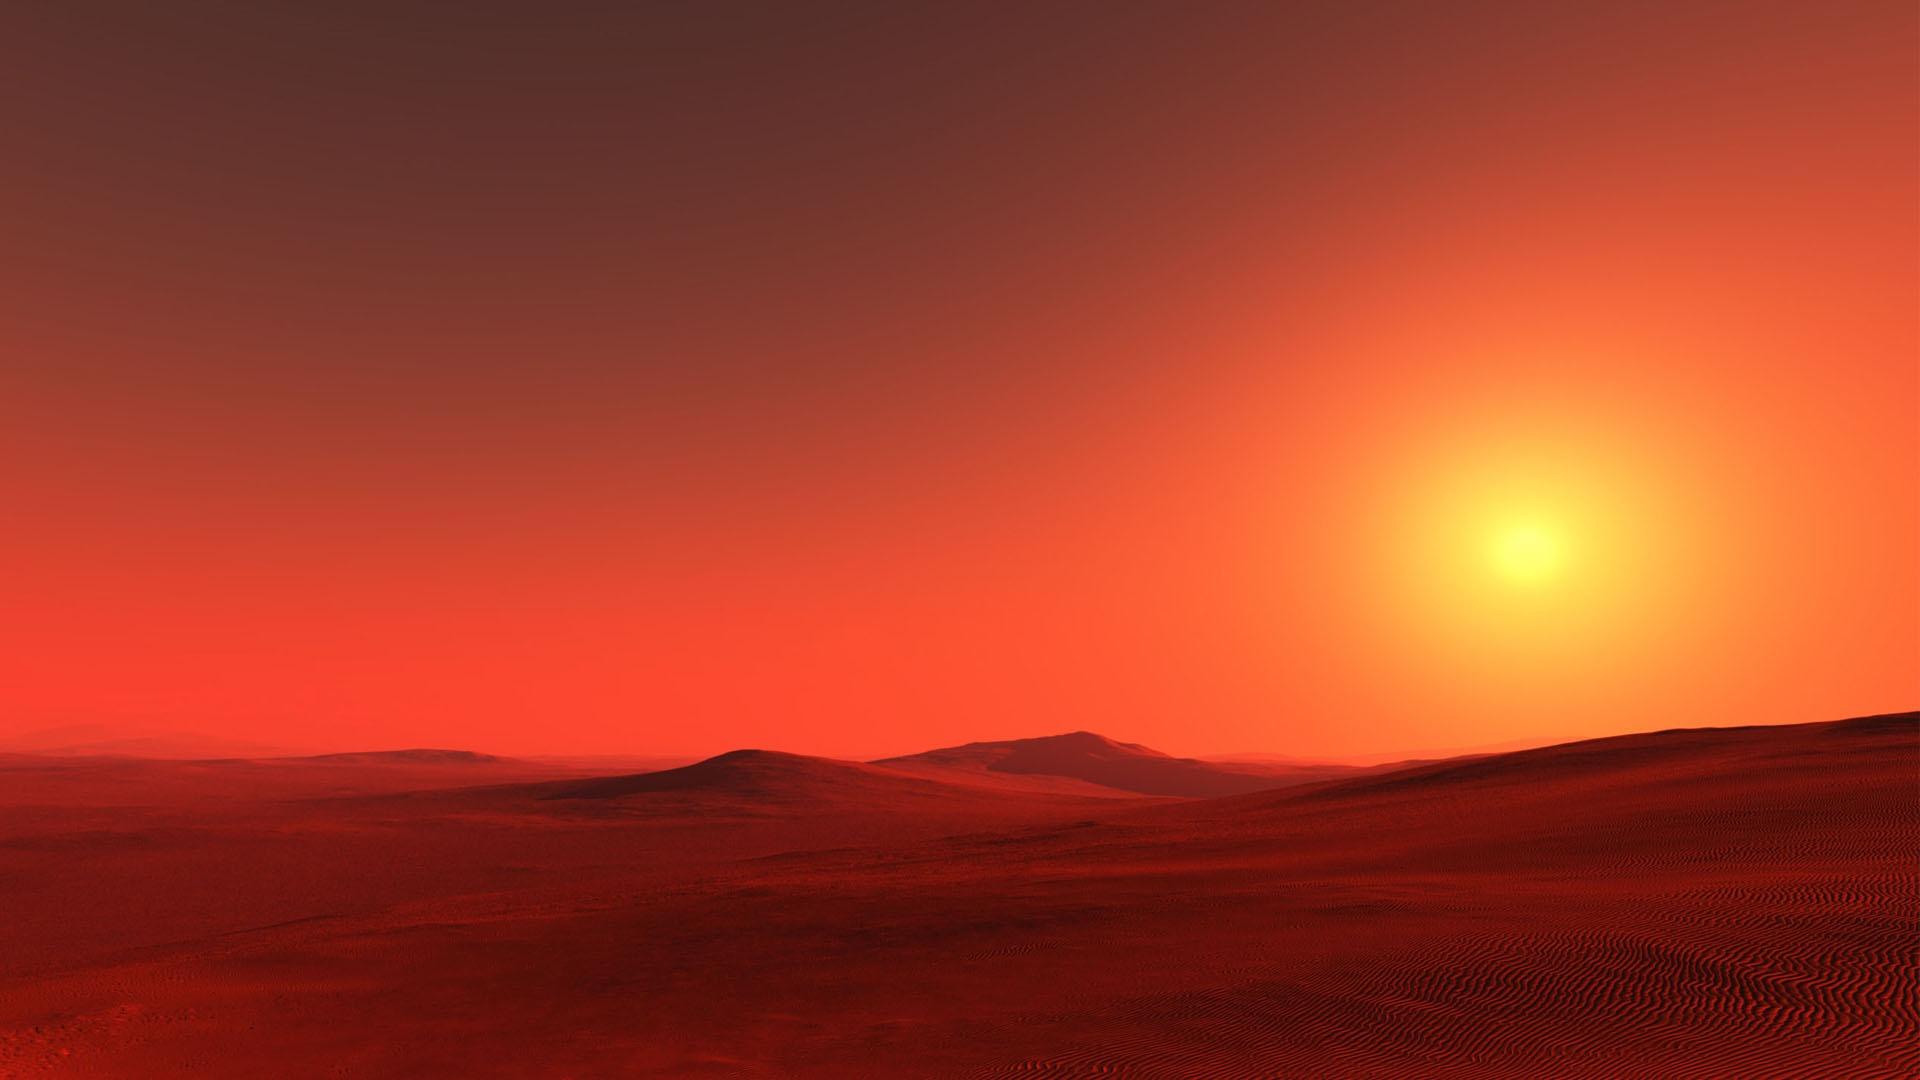 http://3.bp.blogspot.com/-1TuZVyRkQBw/UDJJuOh3wnI/AAAAAAAADjc/K6k9oykVRi0/s1920/china-taklamakan-desert-1080.jpg